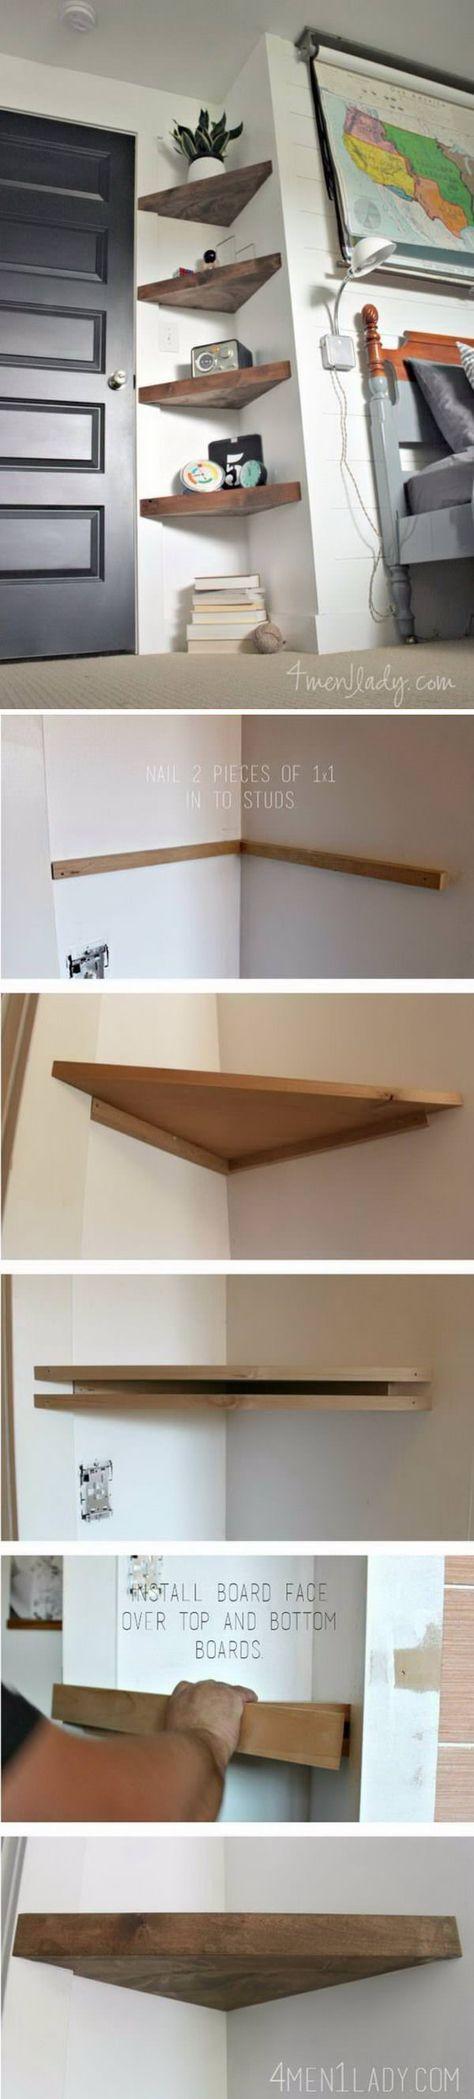 20 DIY Corner Shelves to Beautify Your Awkward Corner